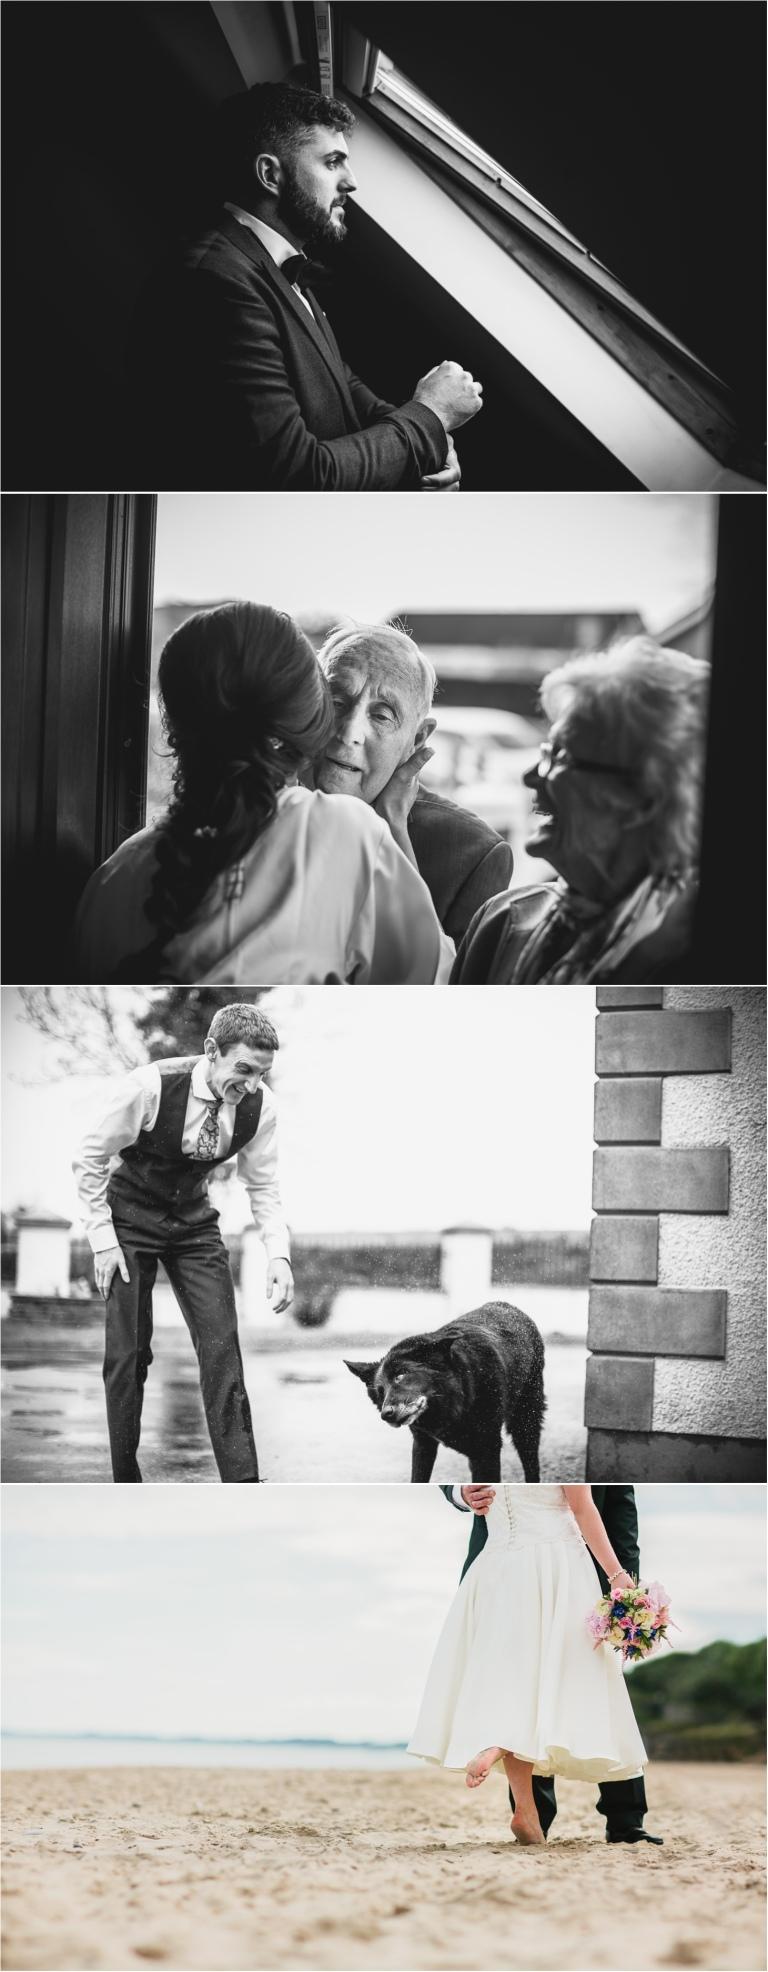 24-darren-fitzpatrick-photography-blog